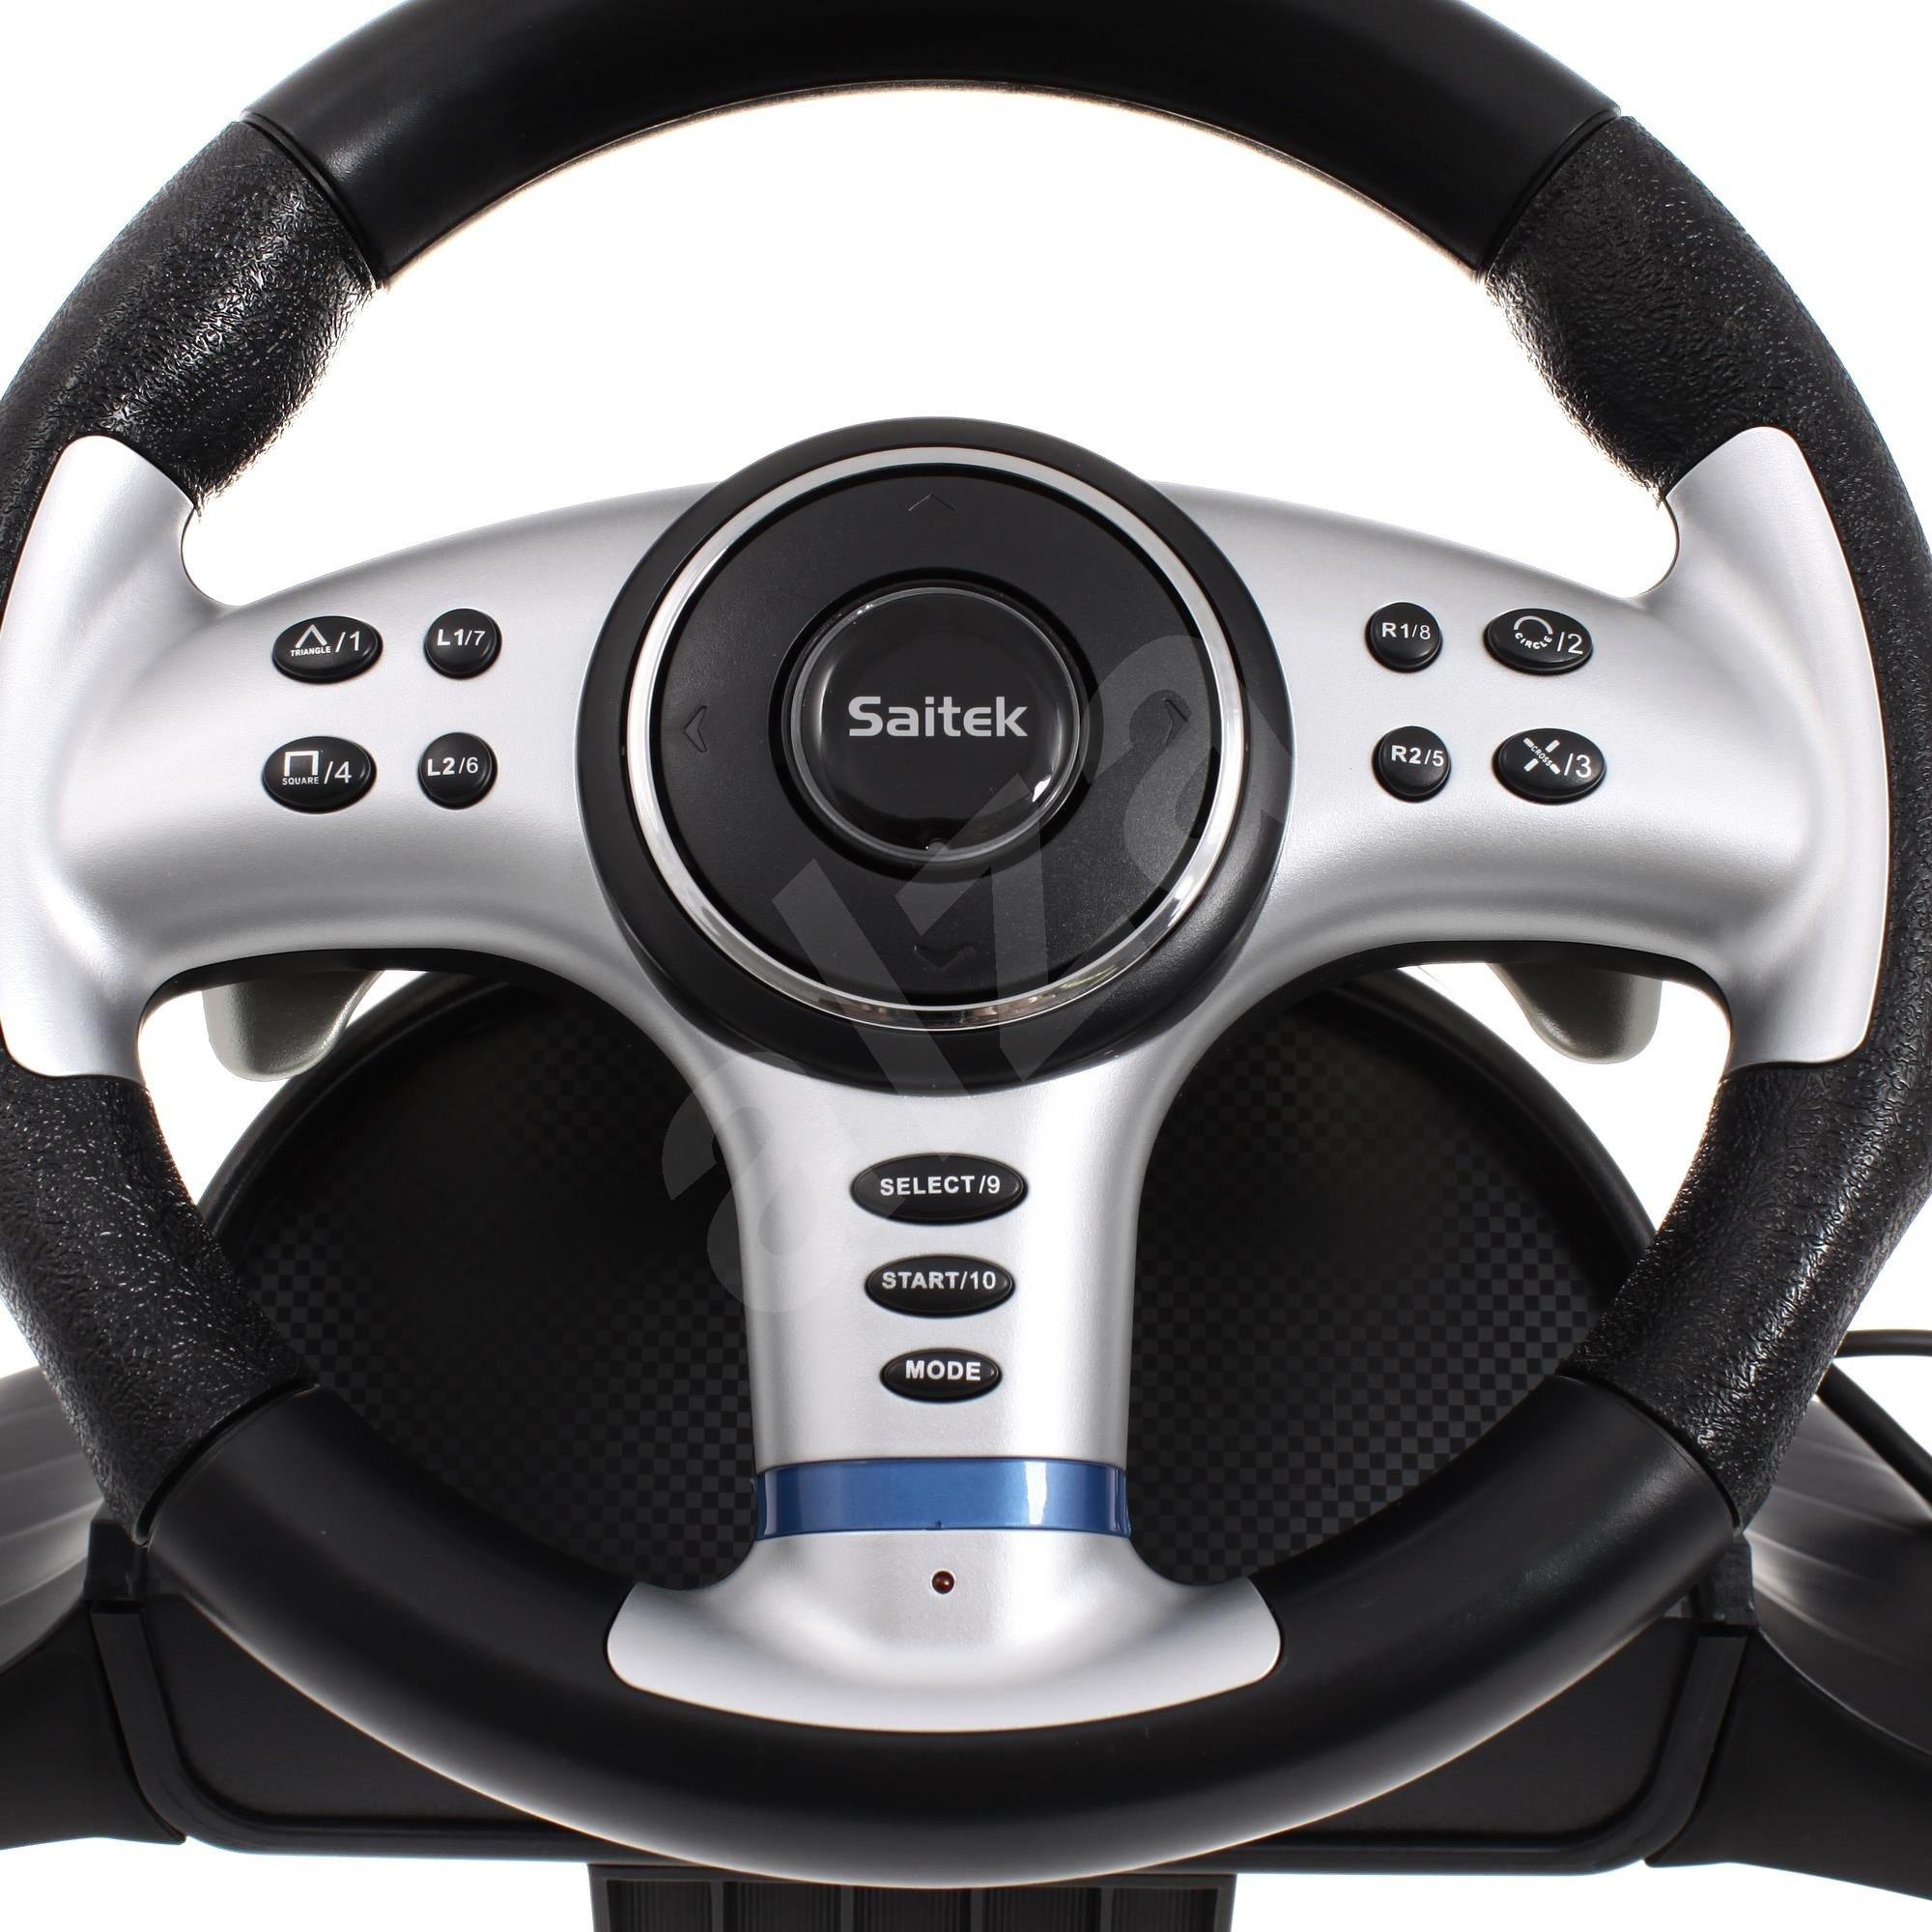 saitek 4v1 vibration wheel volant. Black Bedroom Furniture Sets. Home Design Ideas